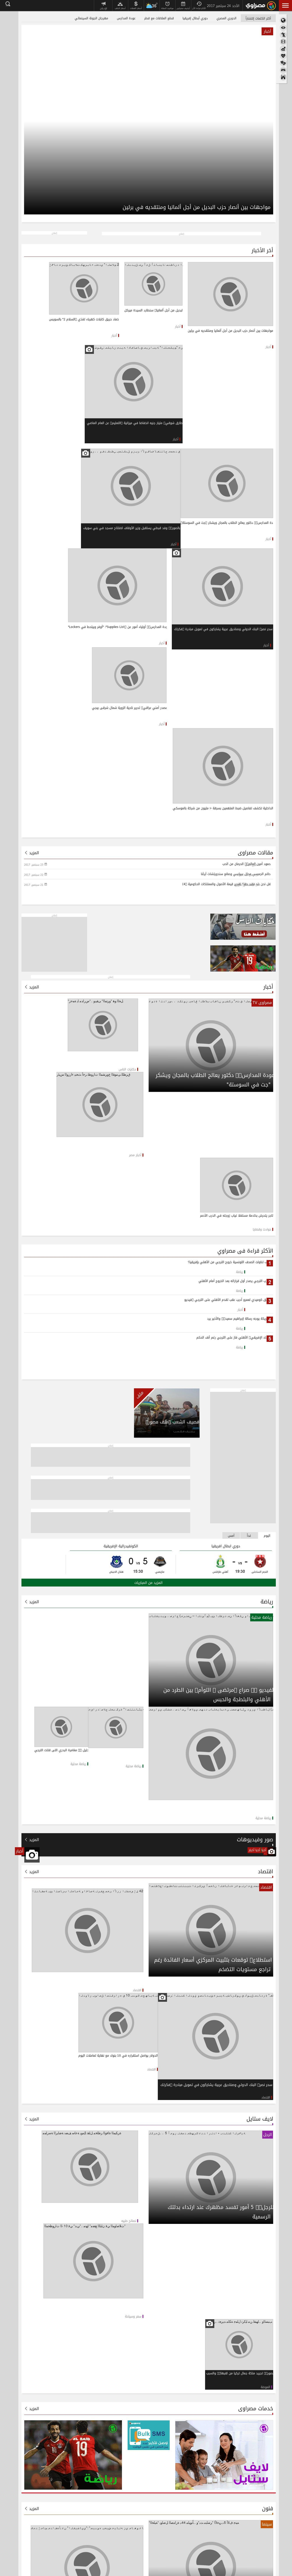 Masrawy at Sunday Sept. 24, 2017, 5:17 p.m. UTC